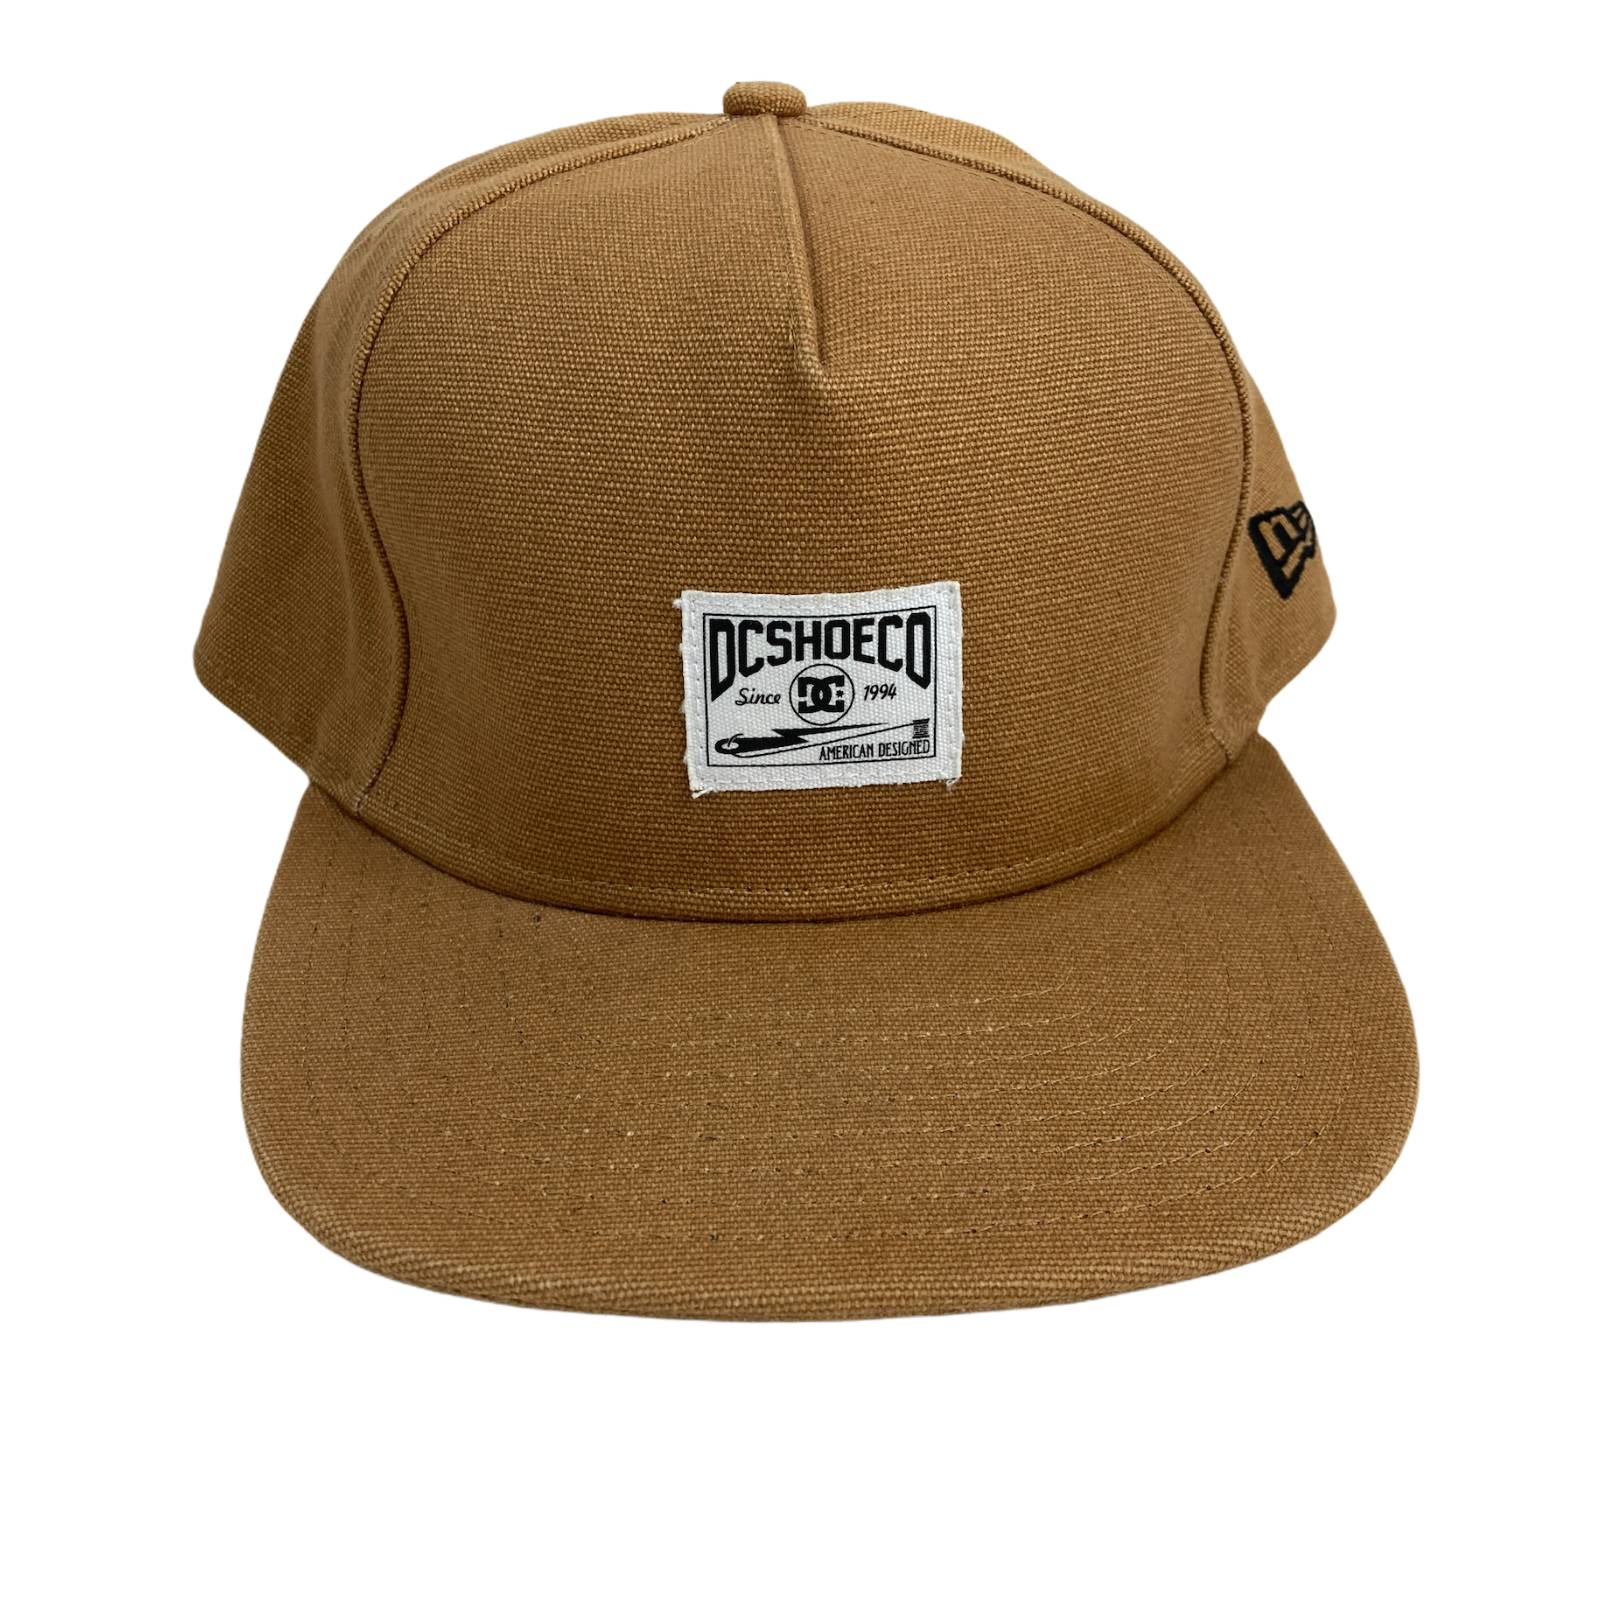 New ERA DC Shoe Brown Snapback Hat